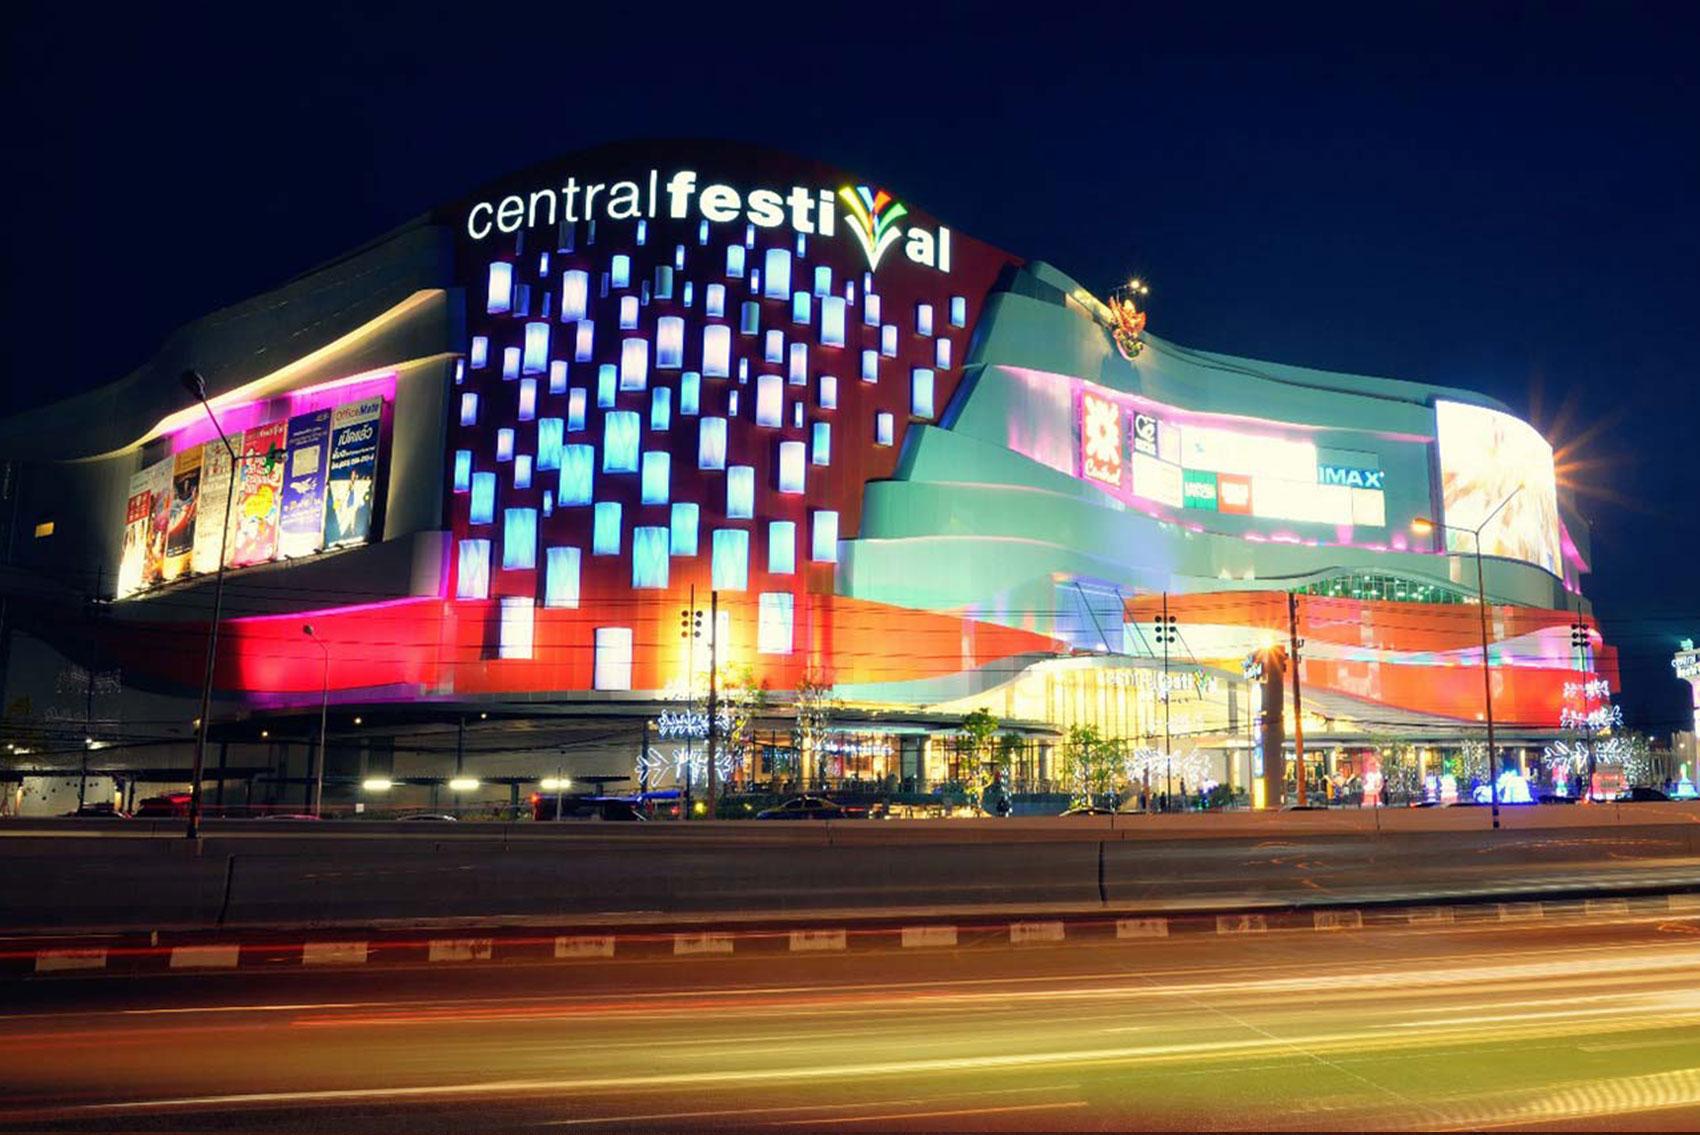 CentralFestival Chiangmai